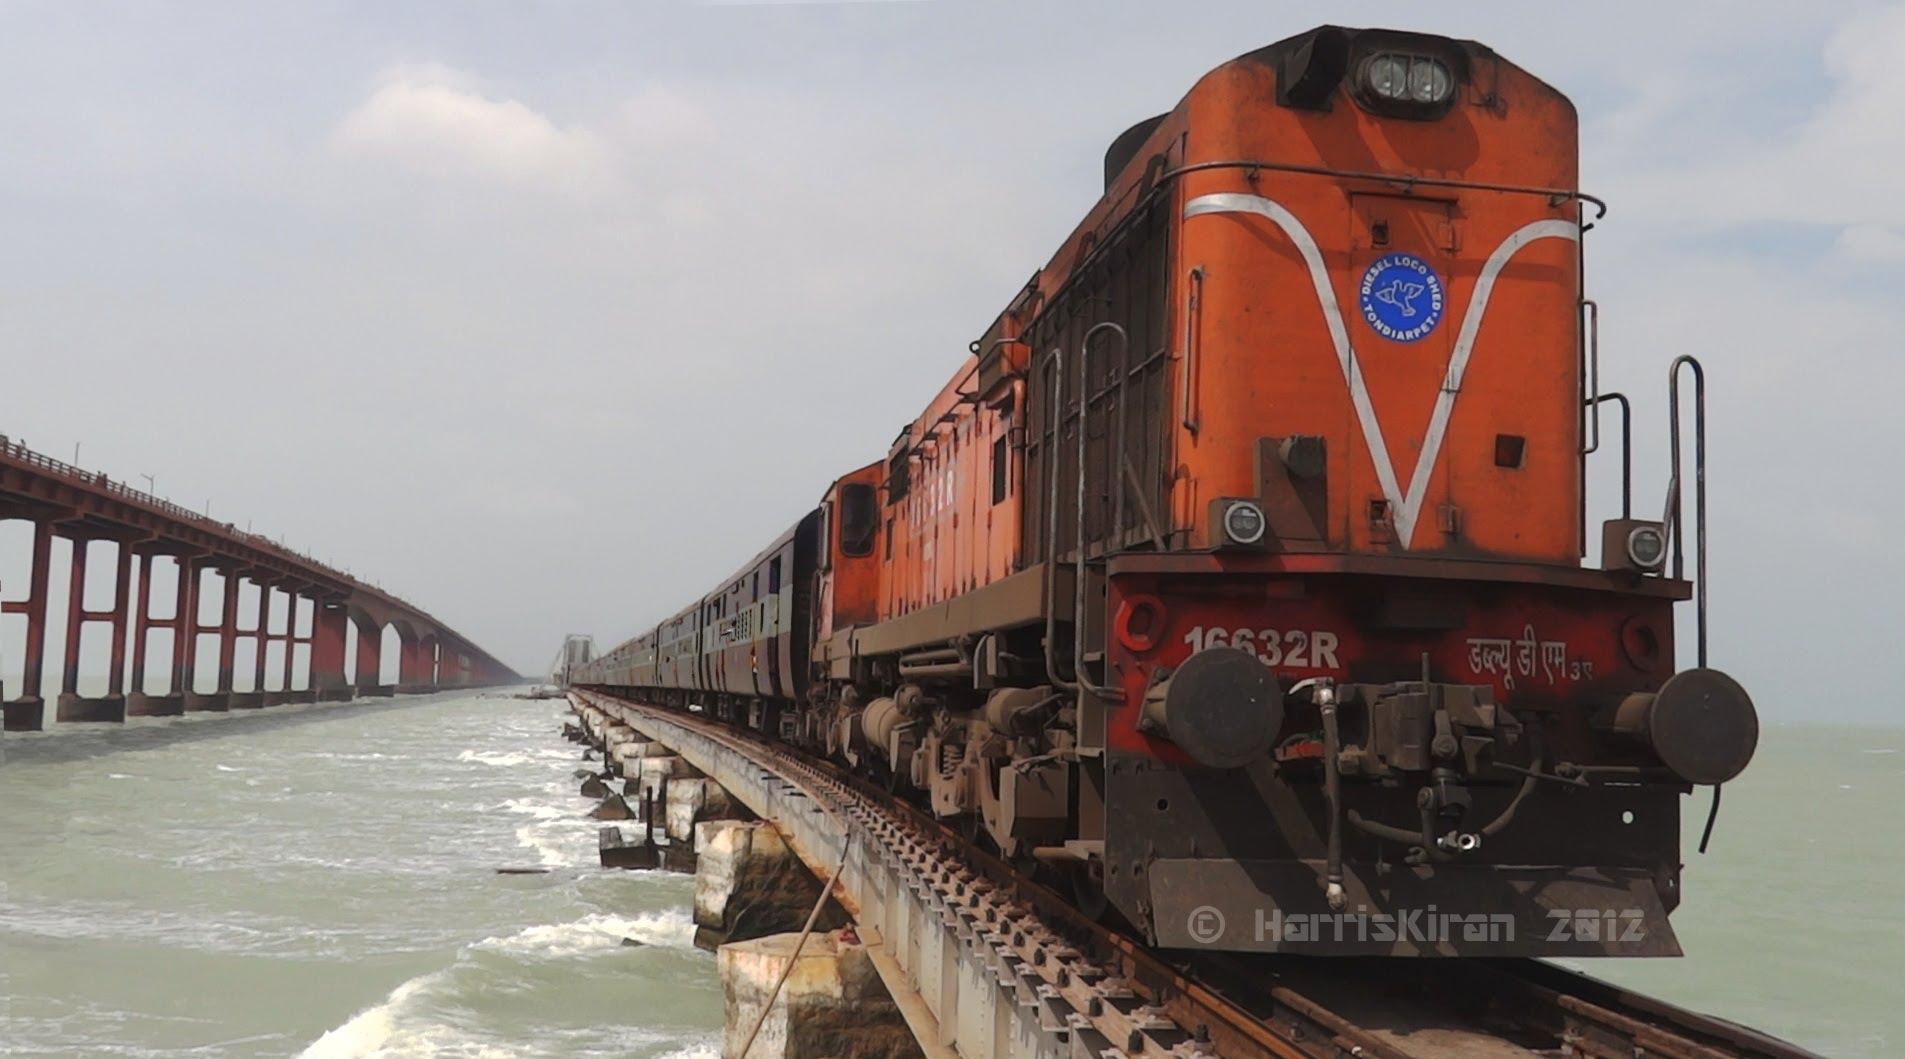 Train on bridge photo